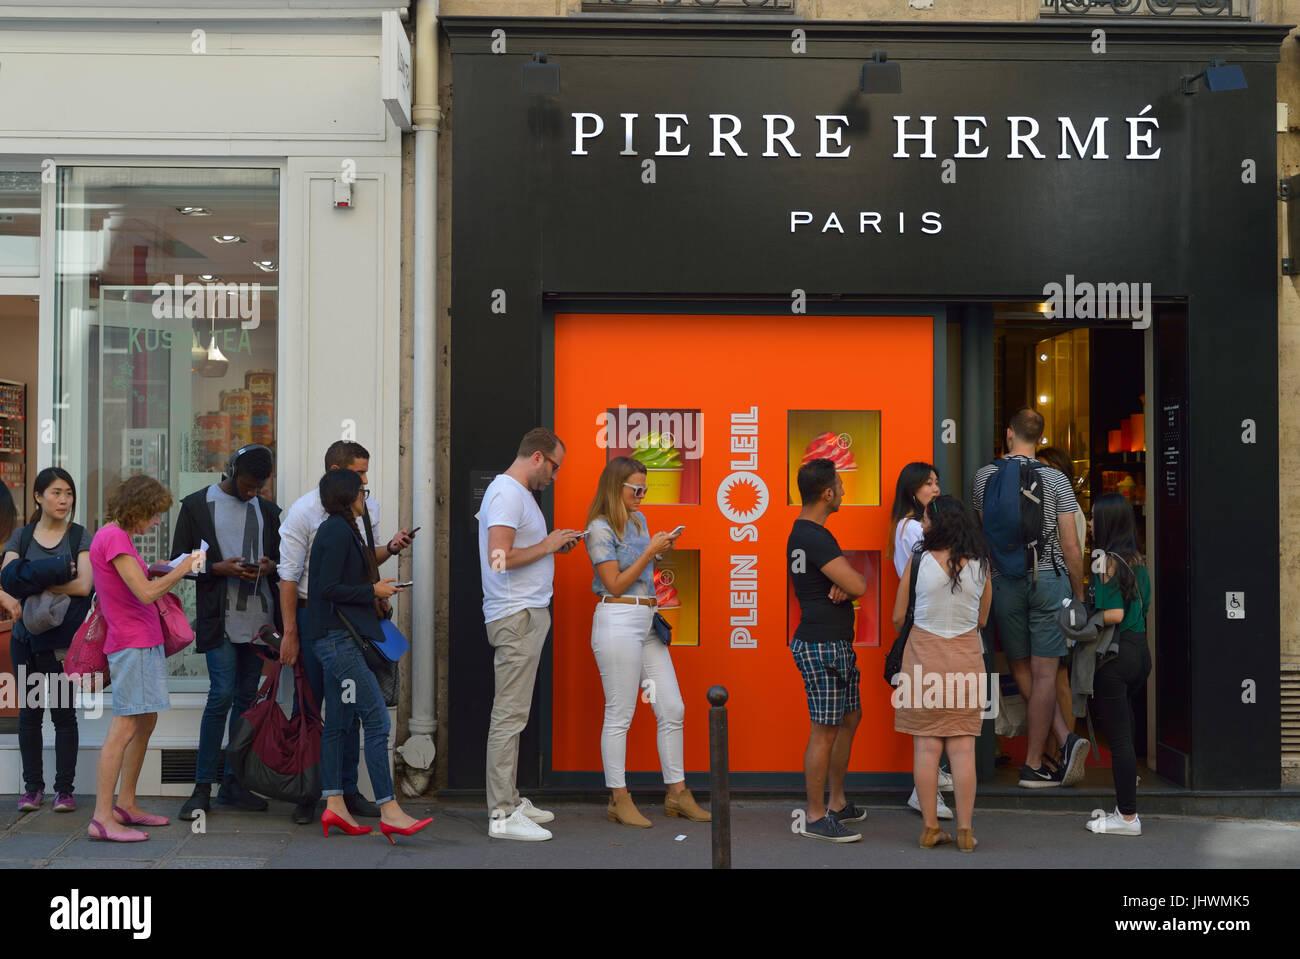 Pierre Herme store, Paris FR - Stock Image